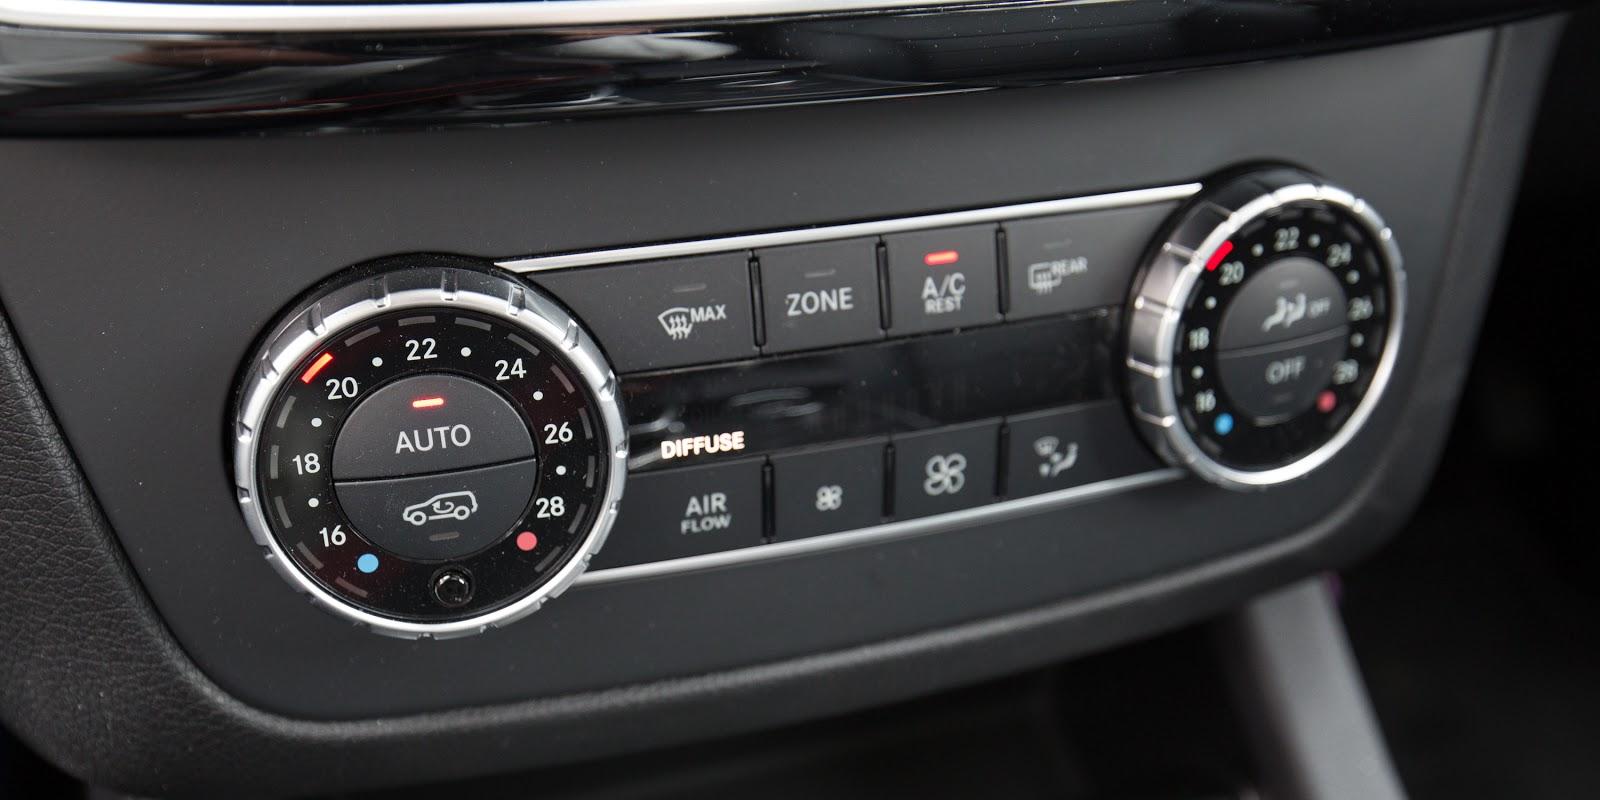 Đánh giá xe Mercedes Benz GLS 2016